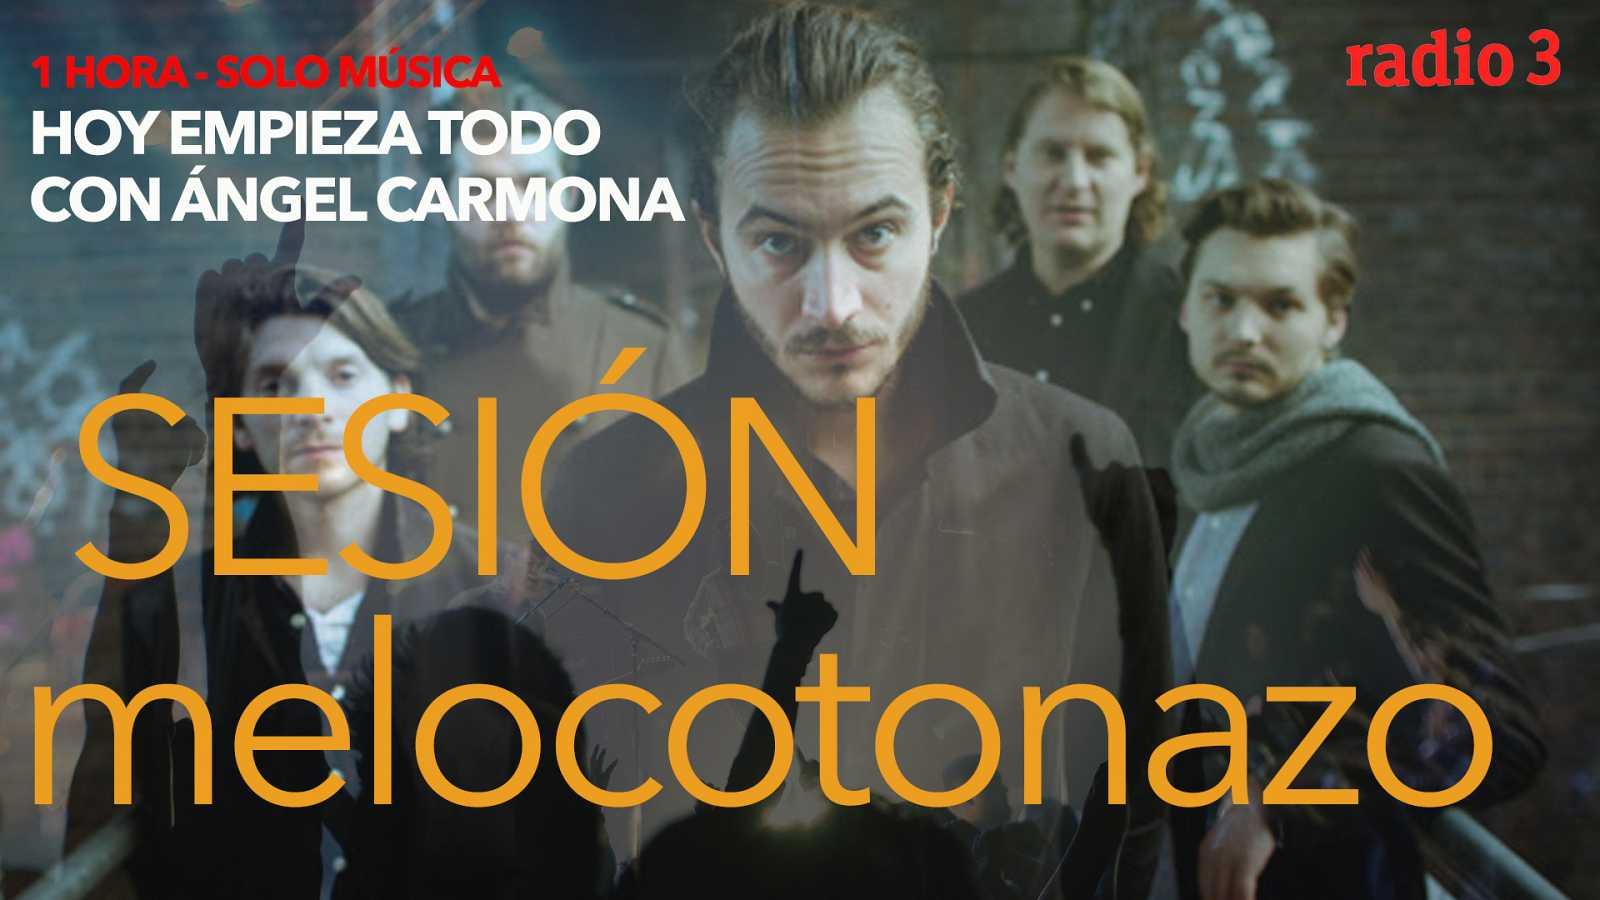 "Hoy empieza todo con Ángel Carmona - ""#SesiónMelocotonazo"": Iggy Pop, Editors, Depeche Mode... - 21/04/21 - escuchar ahora"